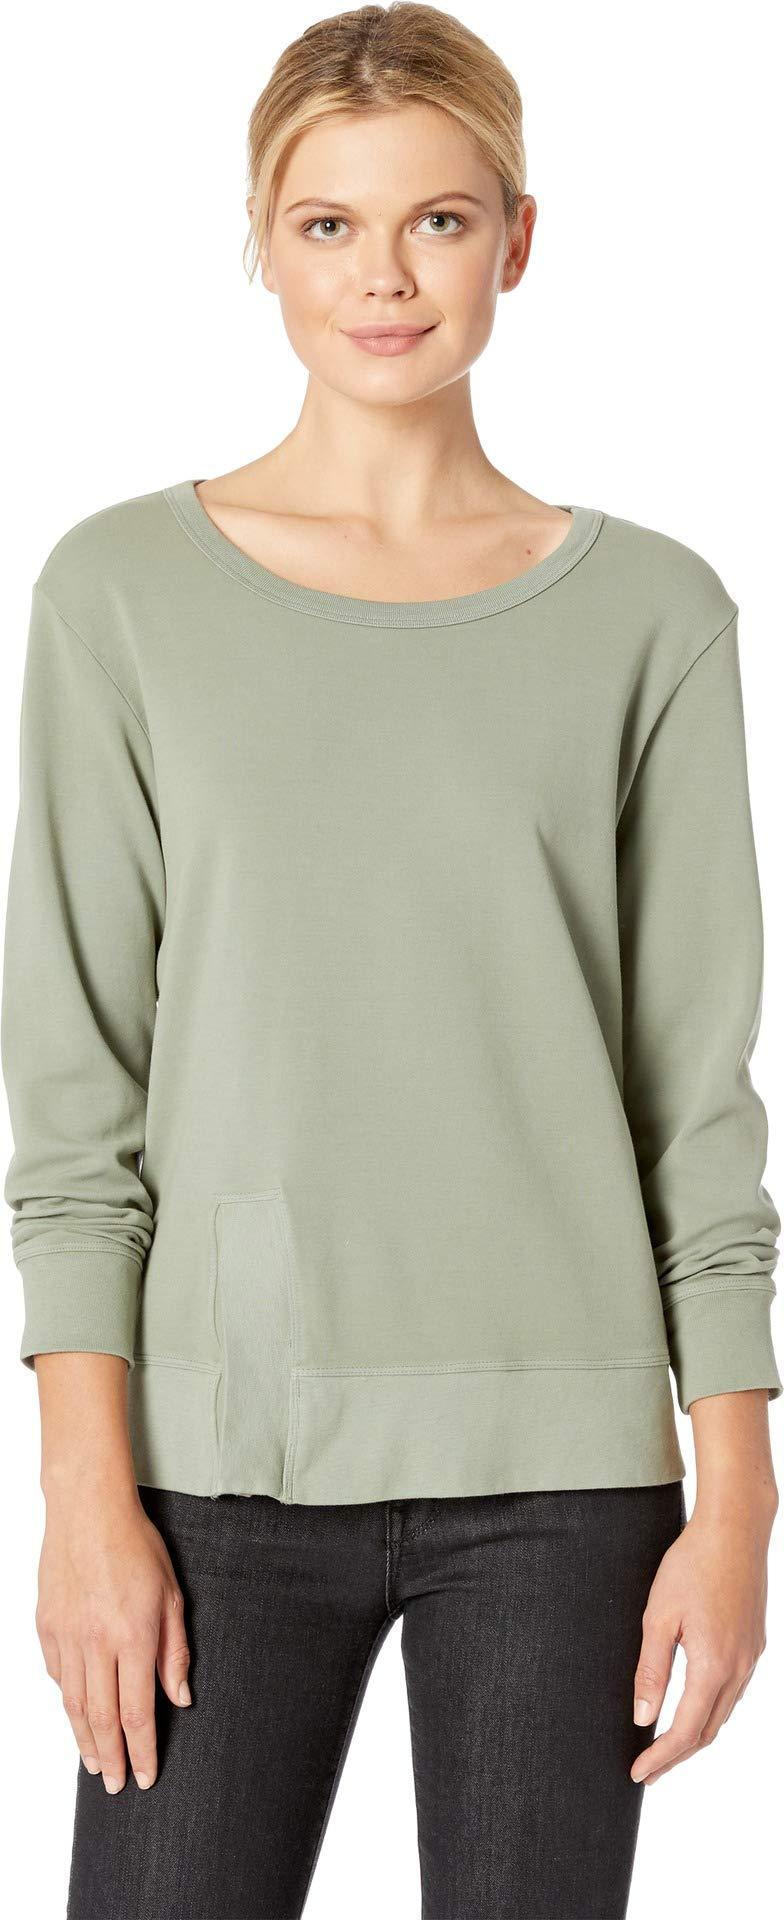 Mod-O-Doc Women's Cotton Interlock Sweatshirt with Asymmetrical Front Slit